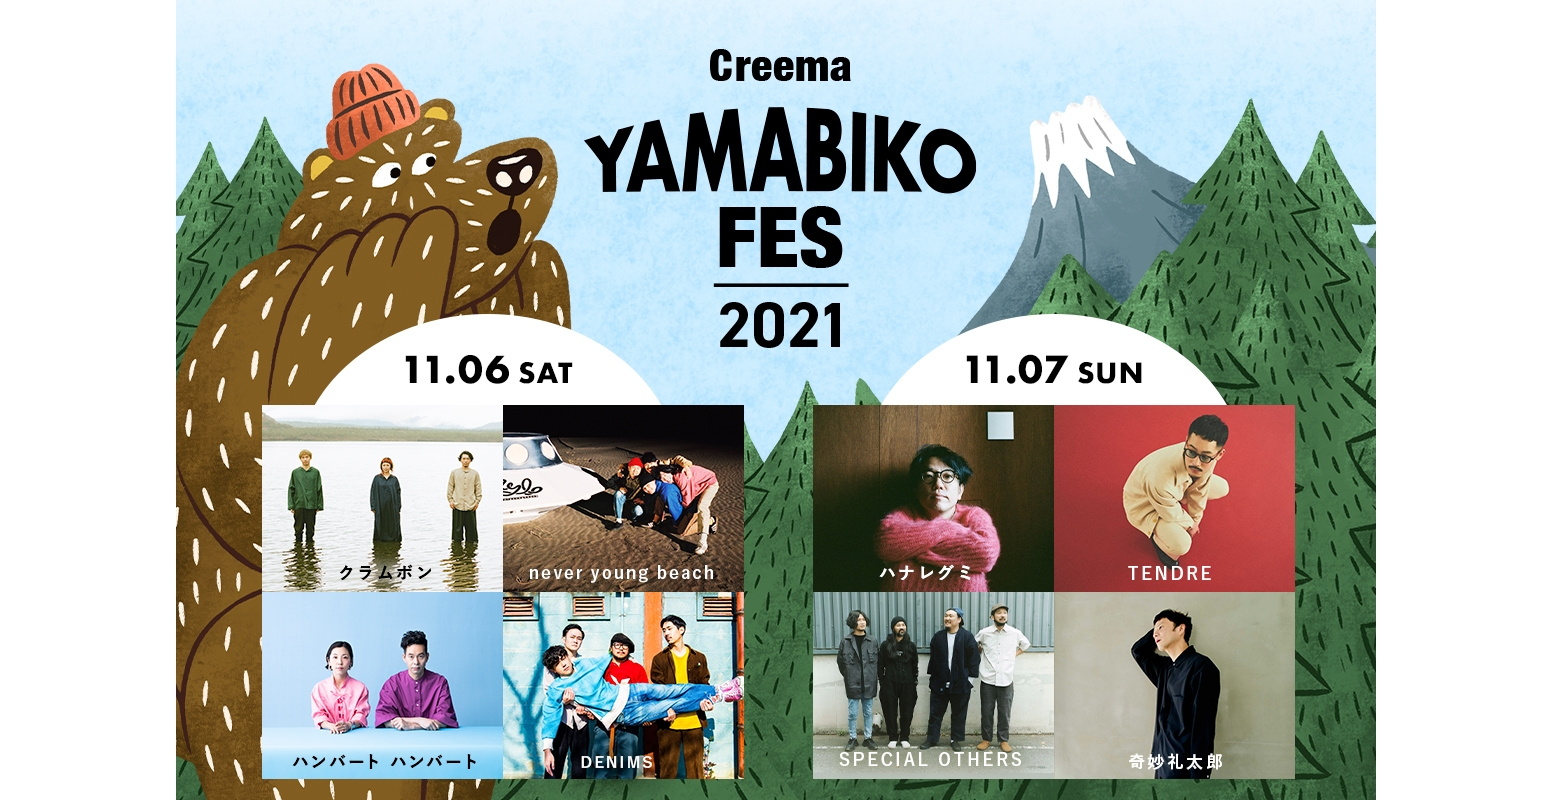 Creema YAMABIKO FES 20211